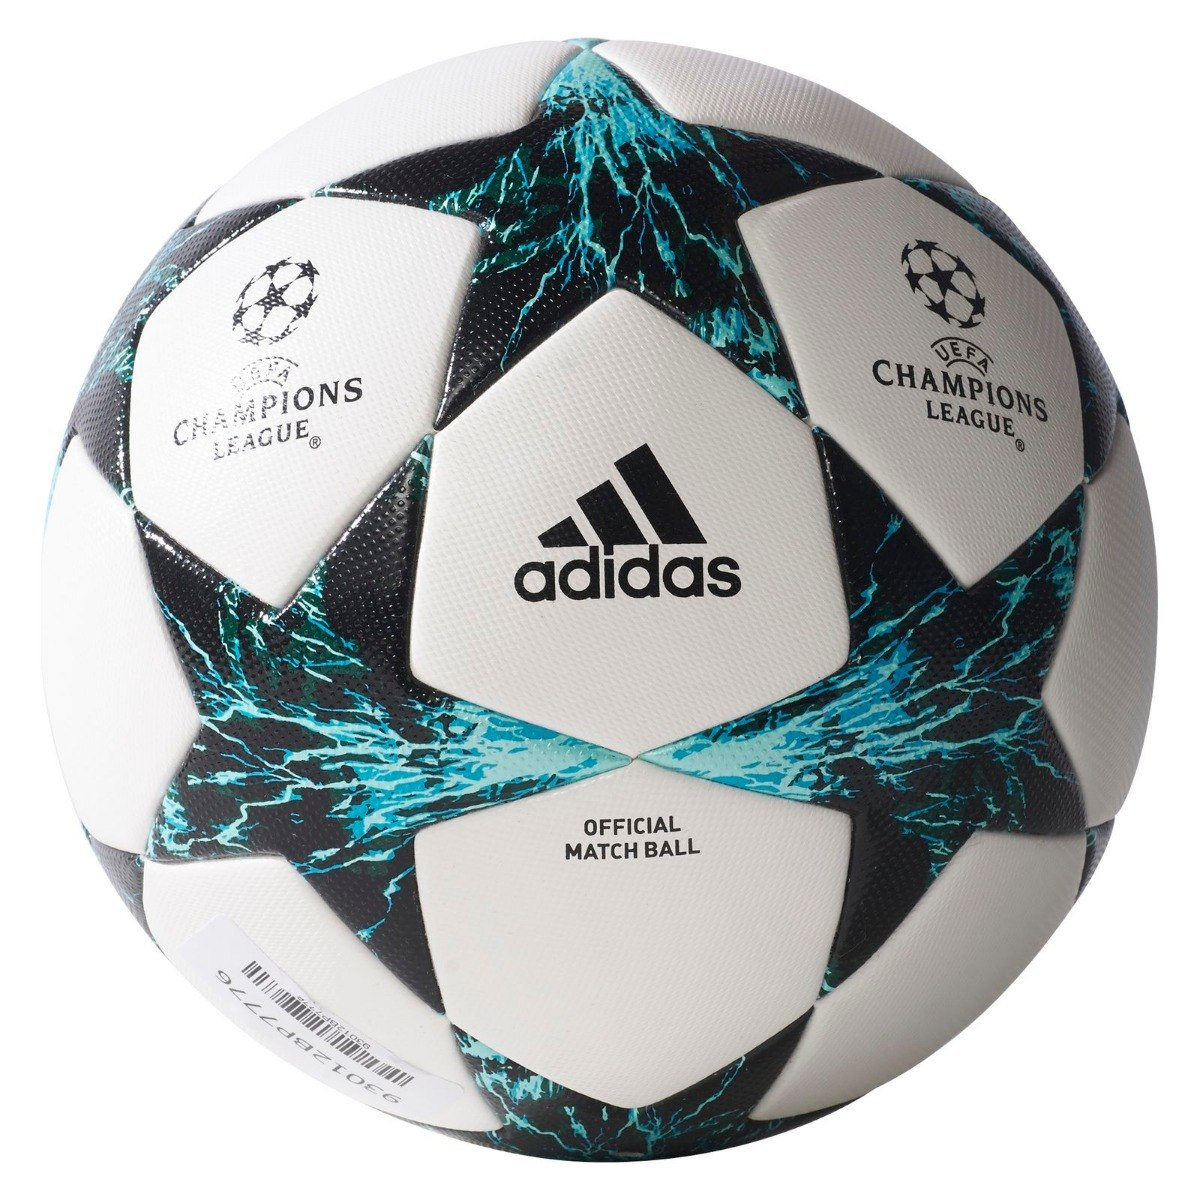 343e187783f61 Bola adidas Champions League Finale Match Ball Omb - R  339